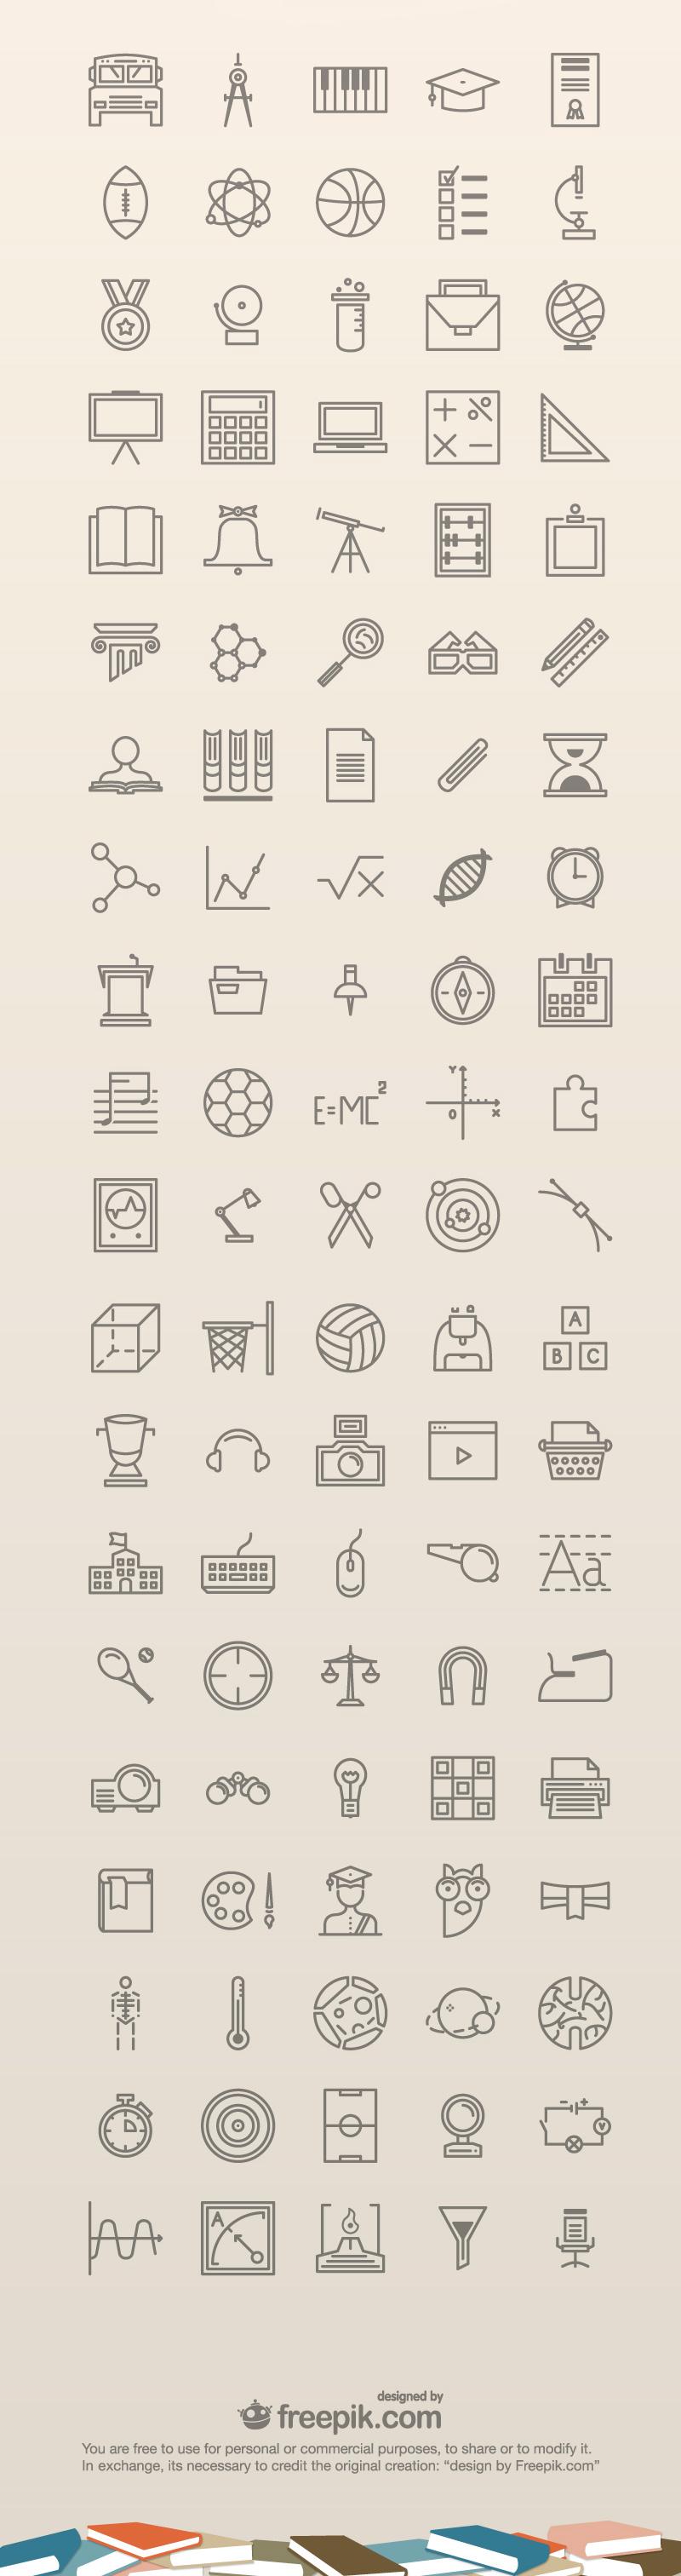 100-free-education-icons